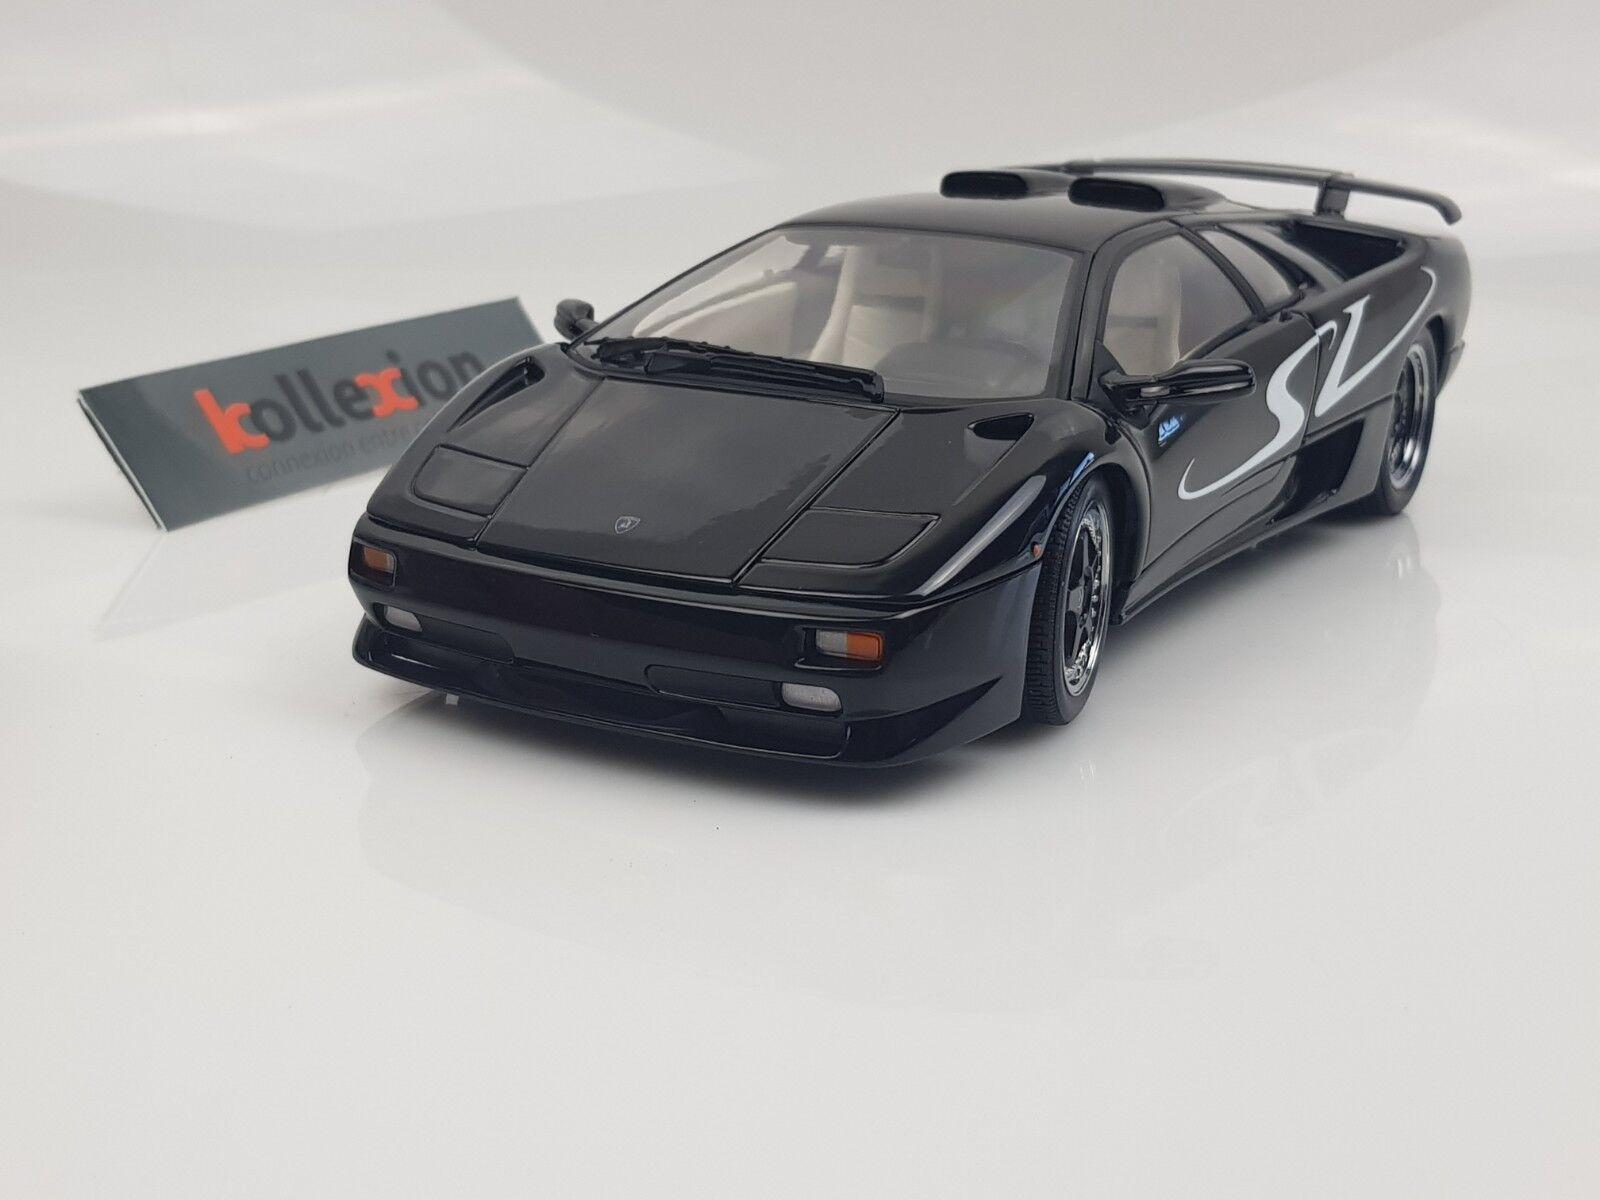 Autoart A70081 Lamborghini Diablo Sv biancaa 1.18 Fans